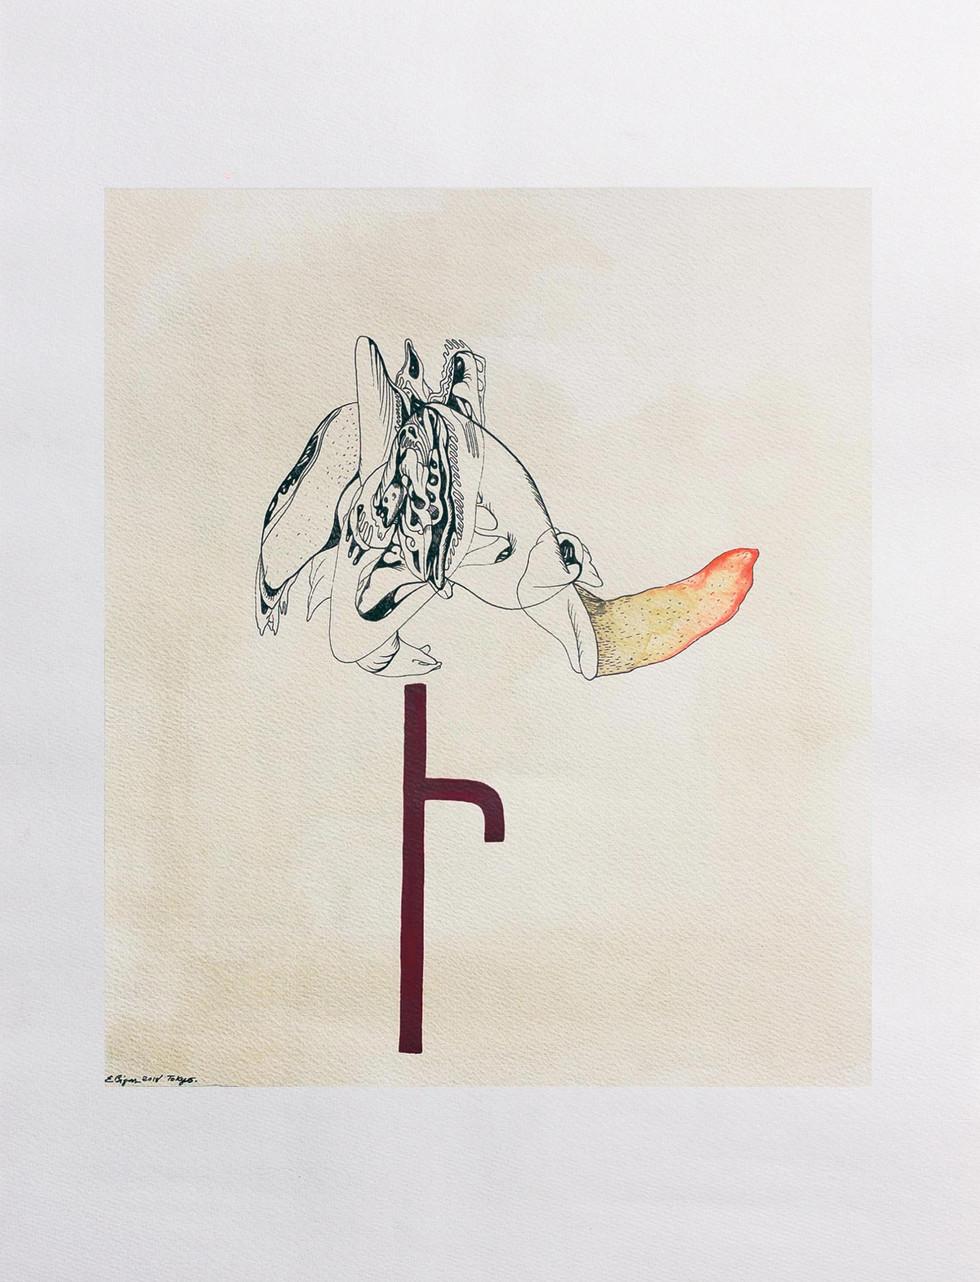 Miyajima-Kukai 2018 45.5cmx55.5cm Tea, gansai and ink on paper